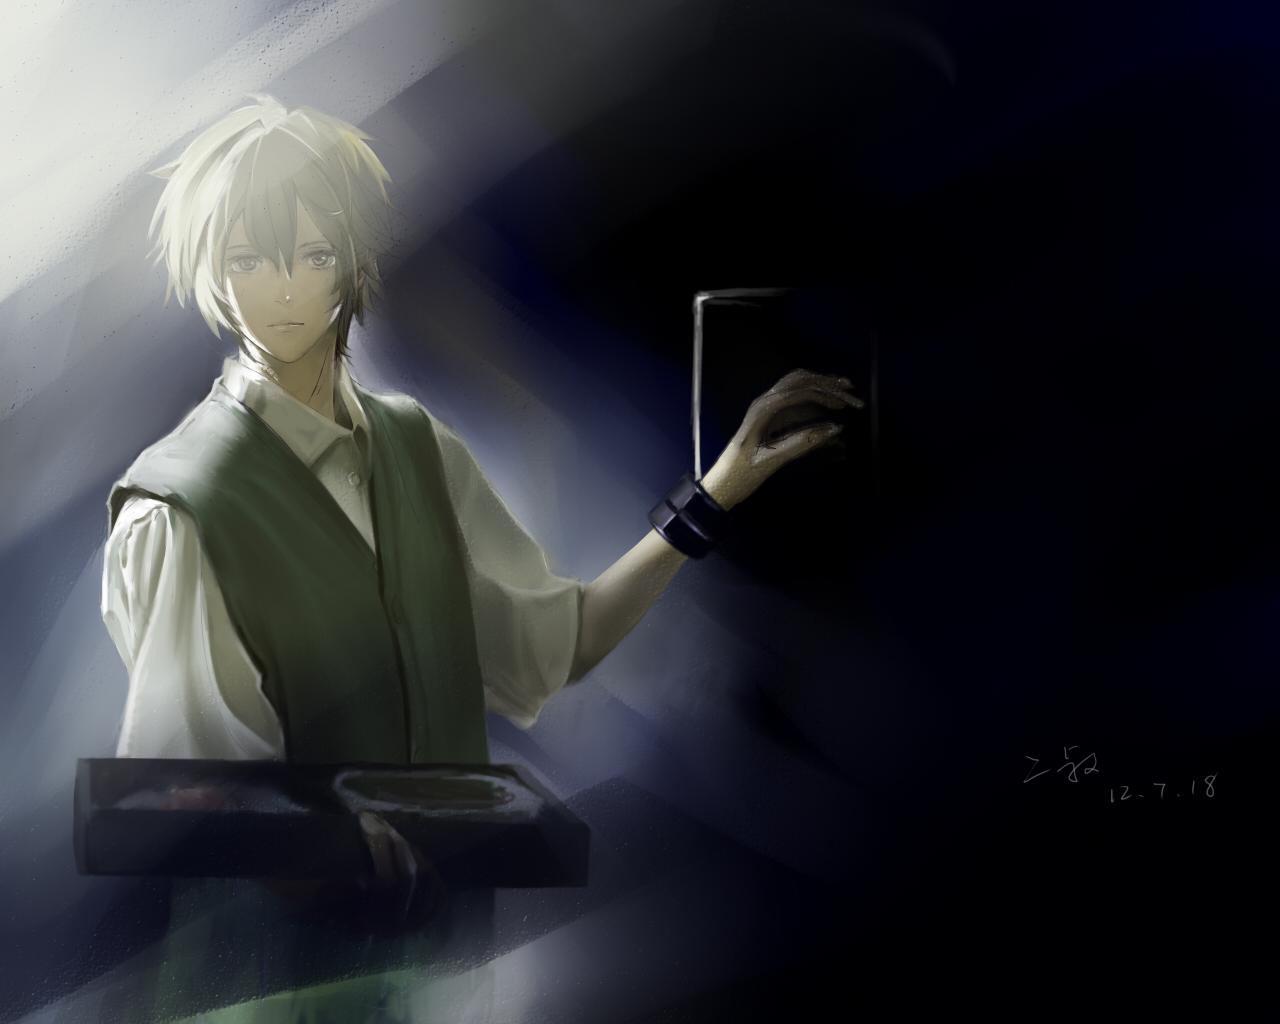 No 6 Anime Characters : Manga anime no japan soompi forums